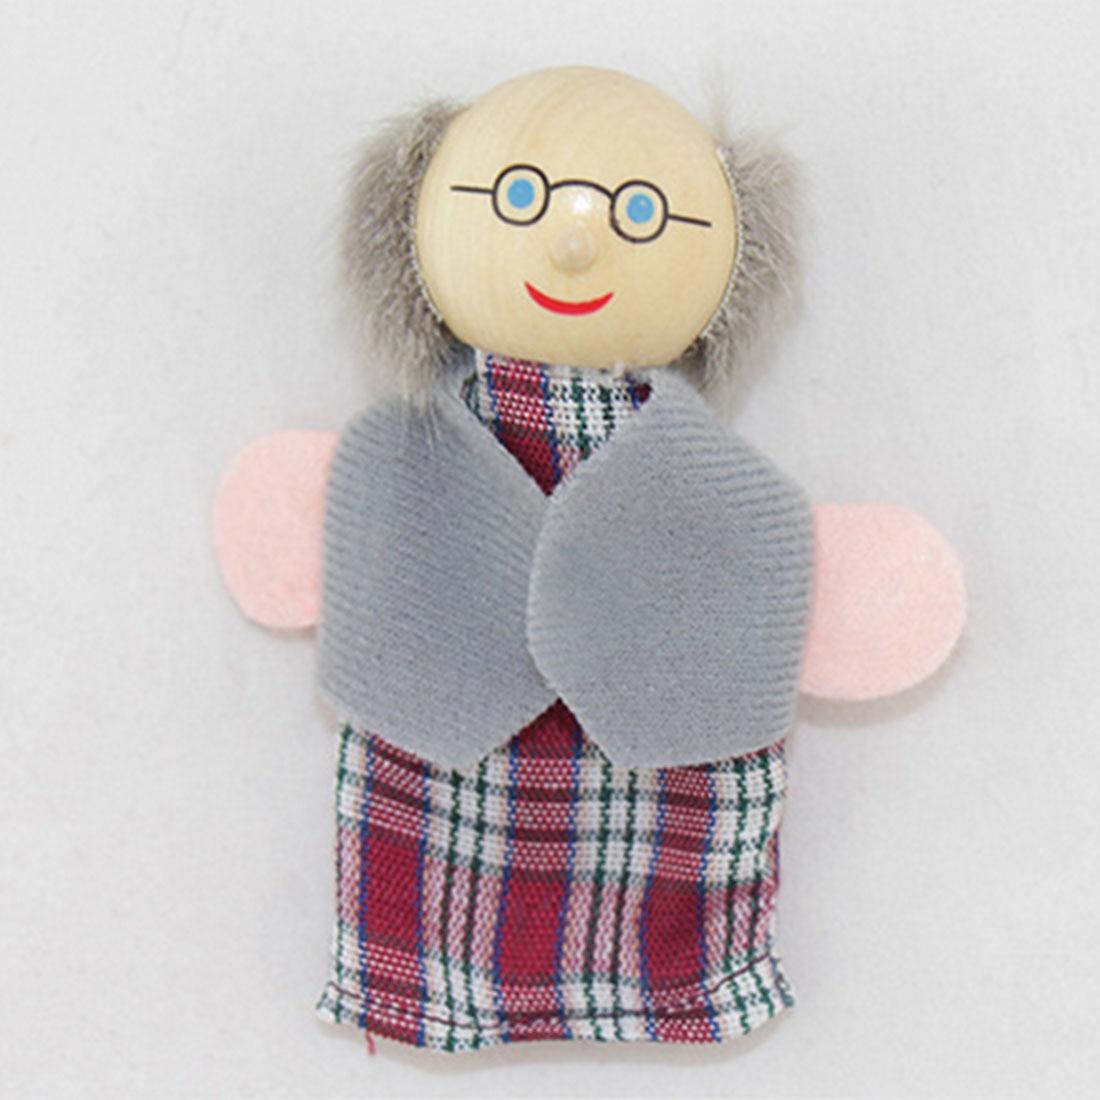 Surwish-6PCSSet-Family-Finger-Puppets-Storytelling-Doll-Kids-Children-Baby-Educational-Toys-5